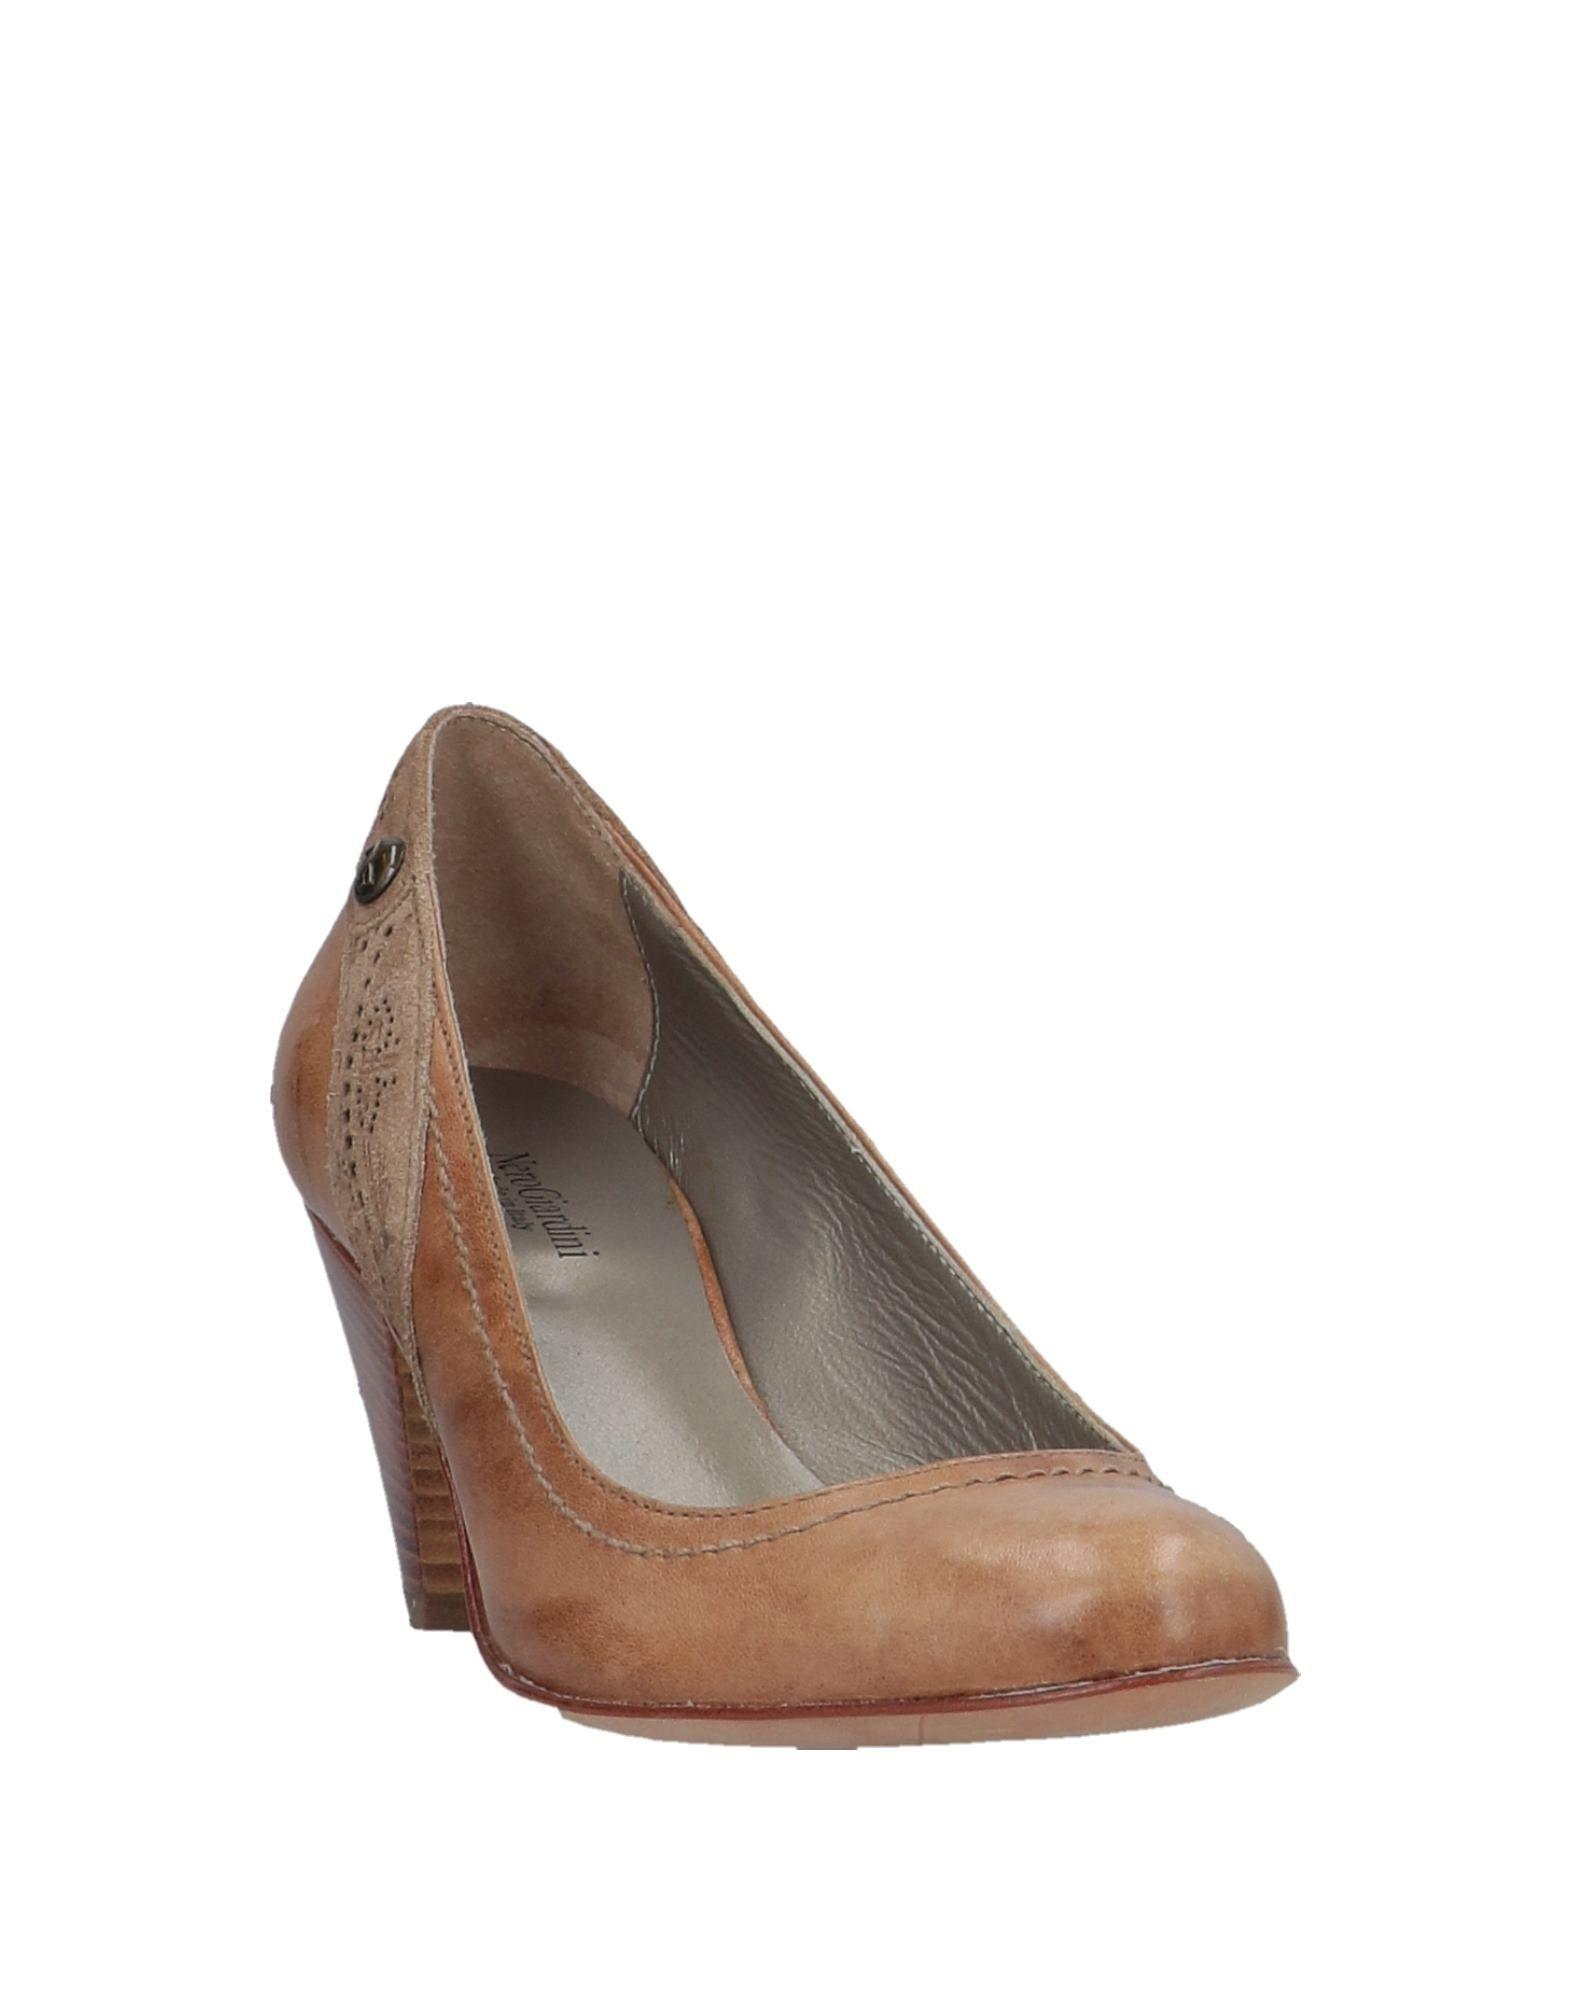 Nero Giardini Pumps Damen  11537592XQ Schuhe Gute Qualität beliebte Schuhe 11537592XQ d560d0